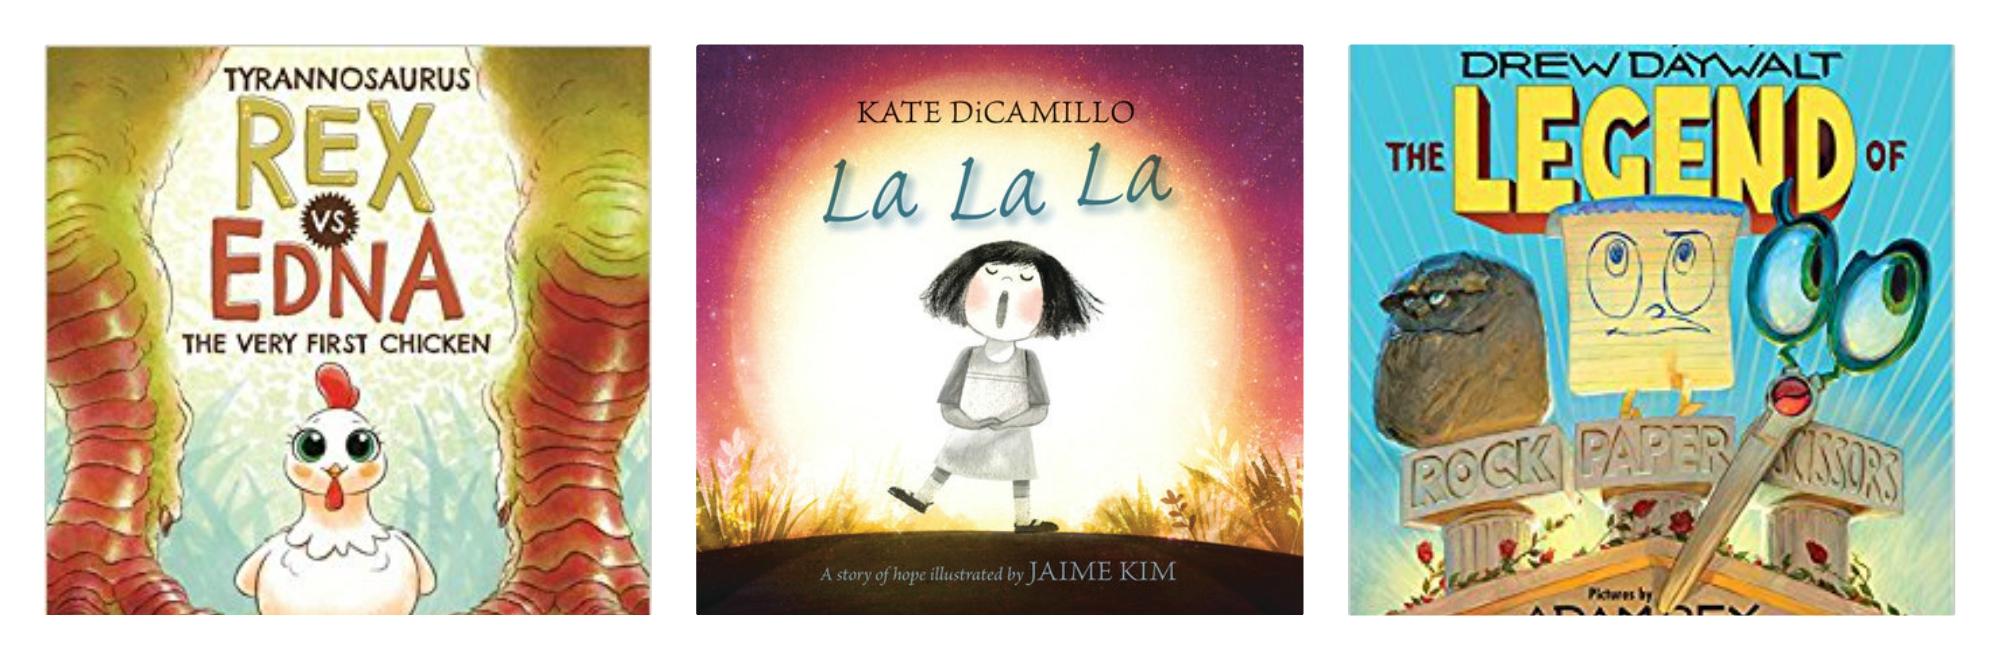 Top 20 Children's Books of 2017